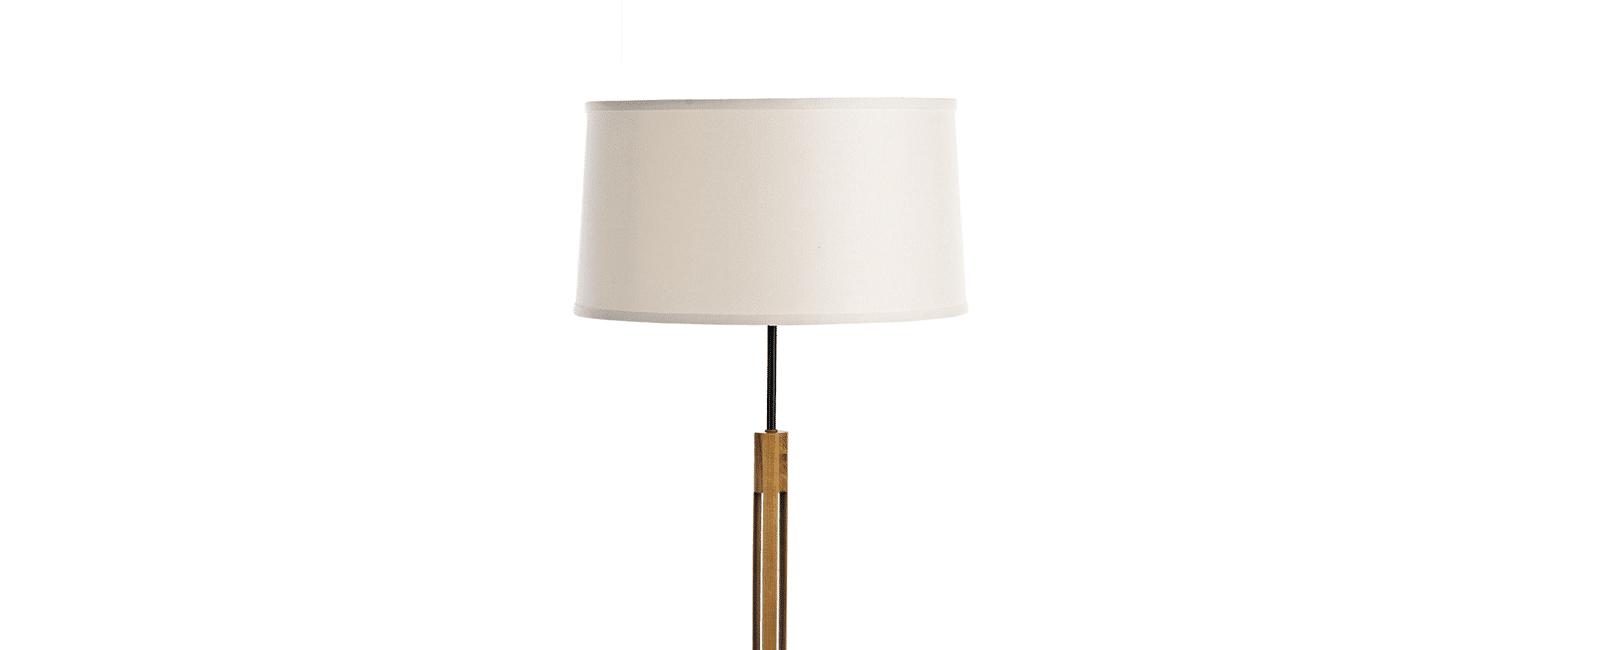 lamparas decorativas para personalizar tu hogar